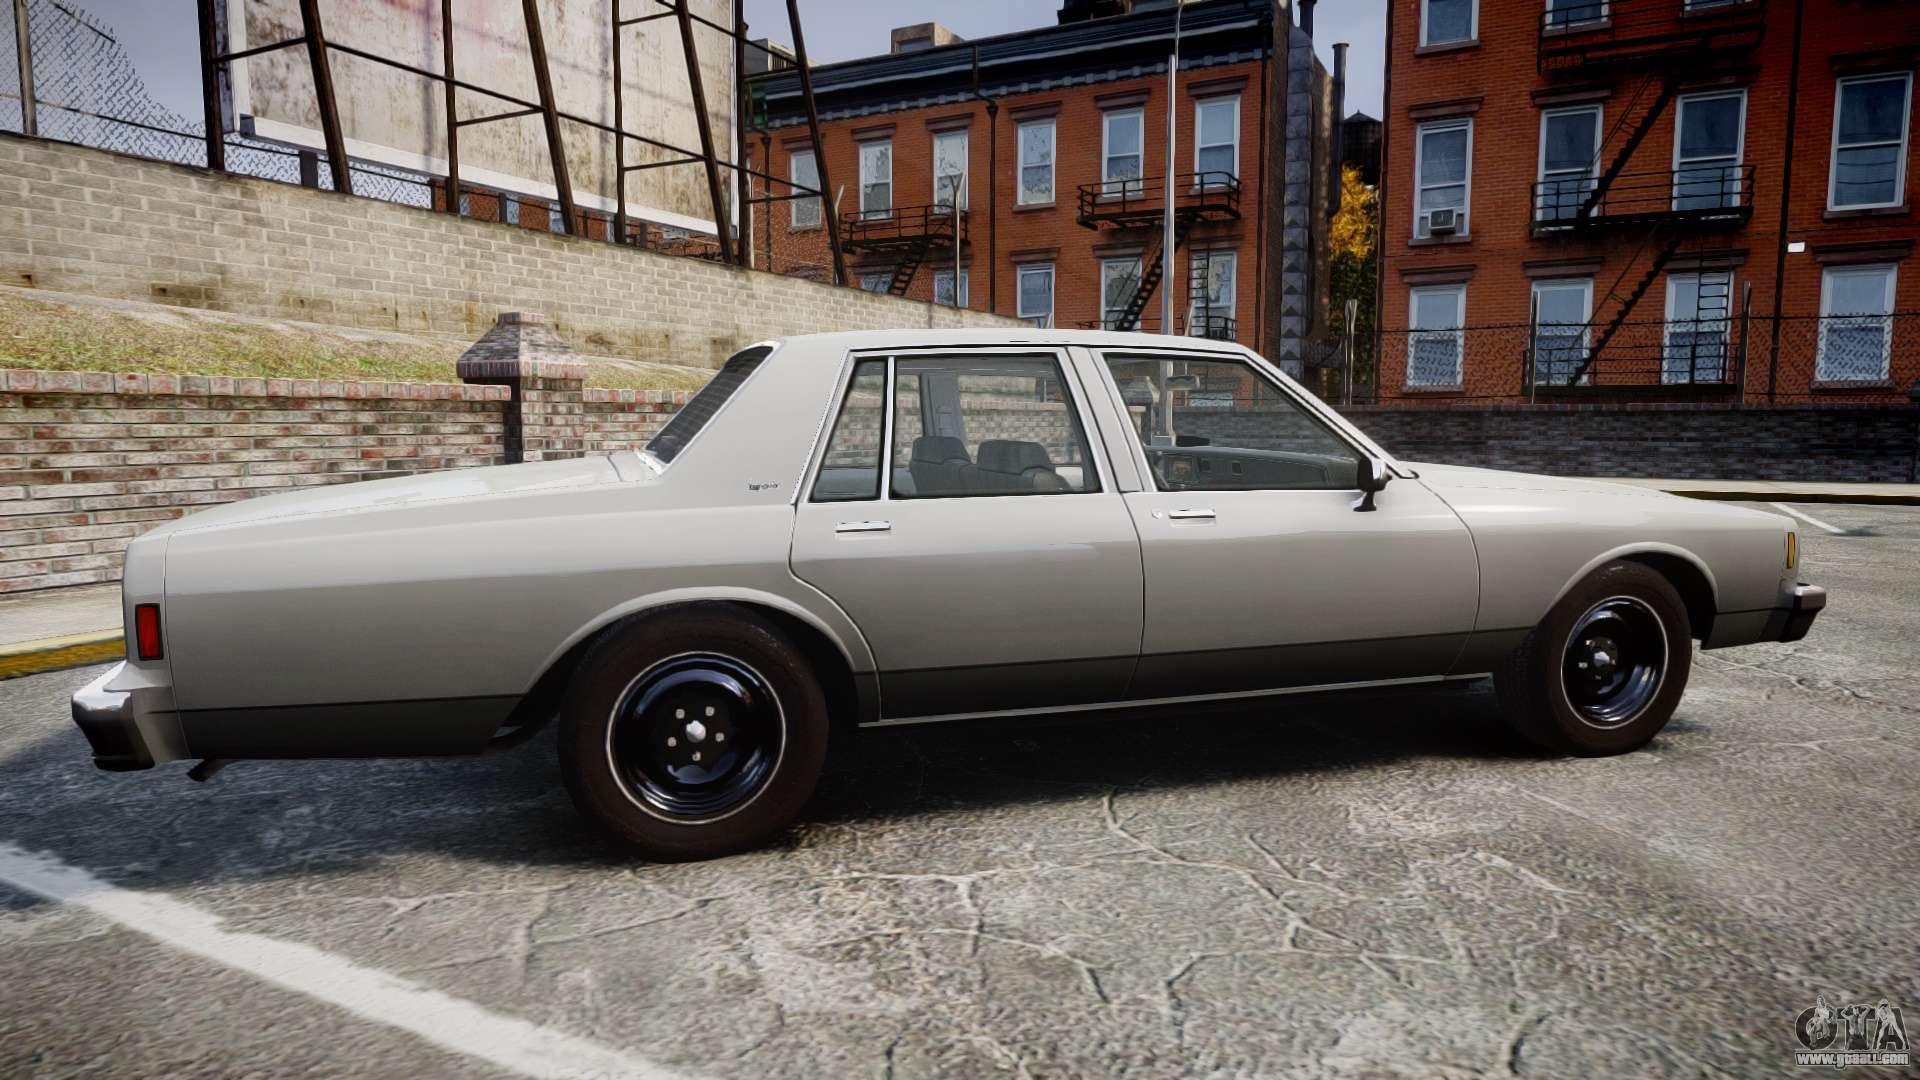 chevrolet impala 1985 for gta 4. Black Bedroom Furniture Sets. Home Design Ideas